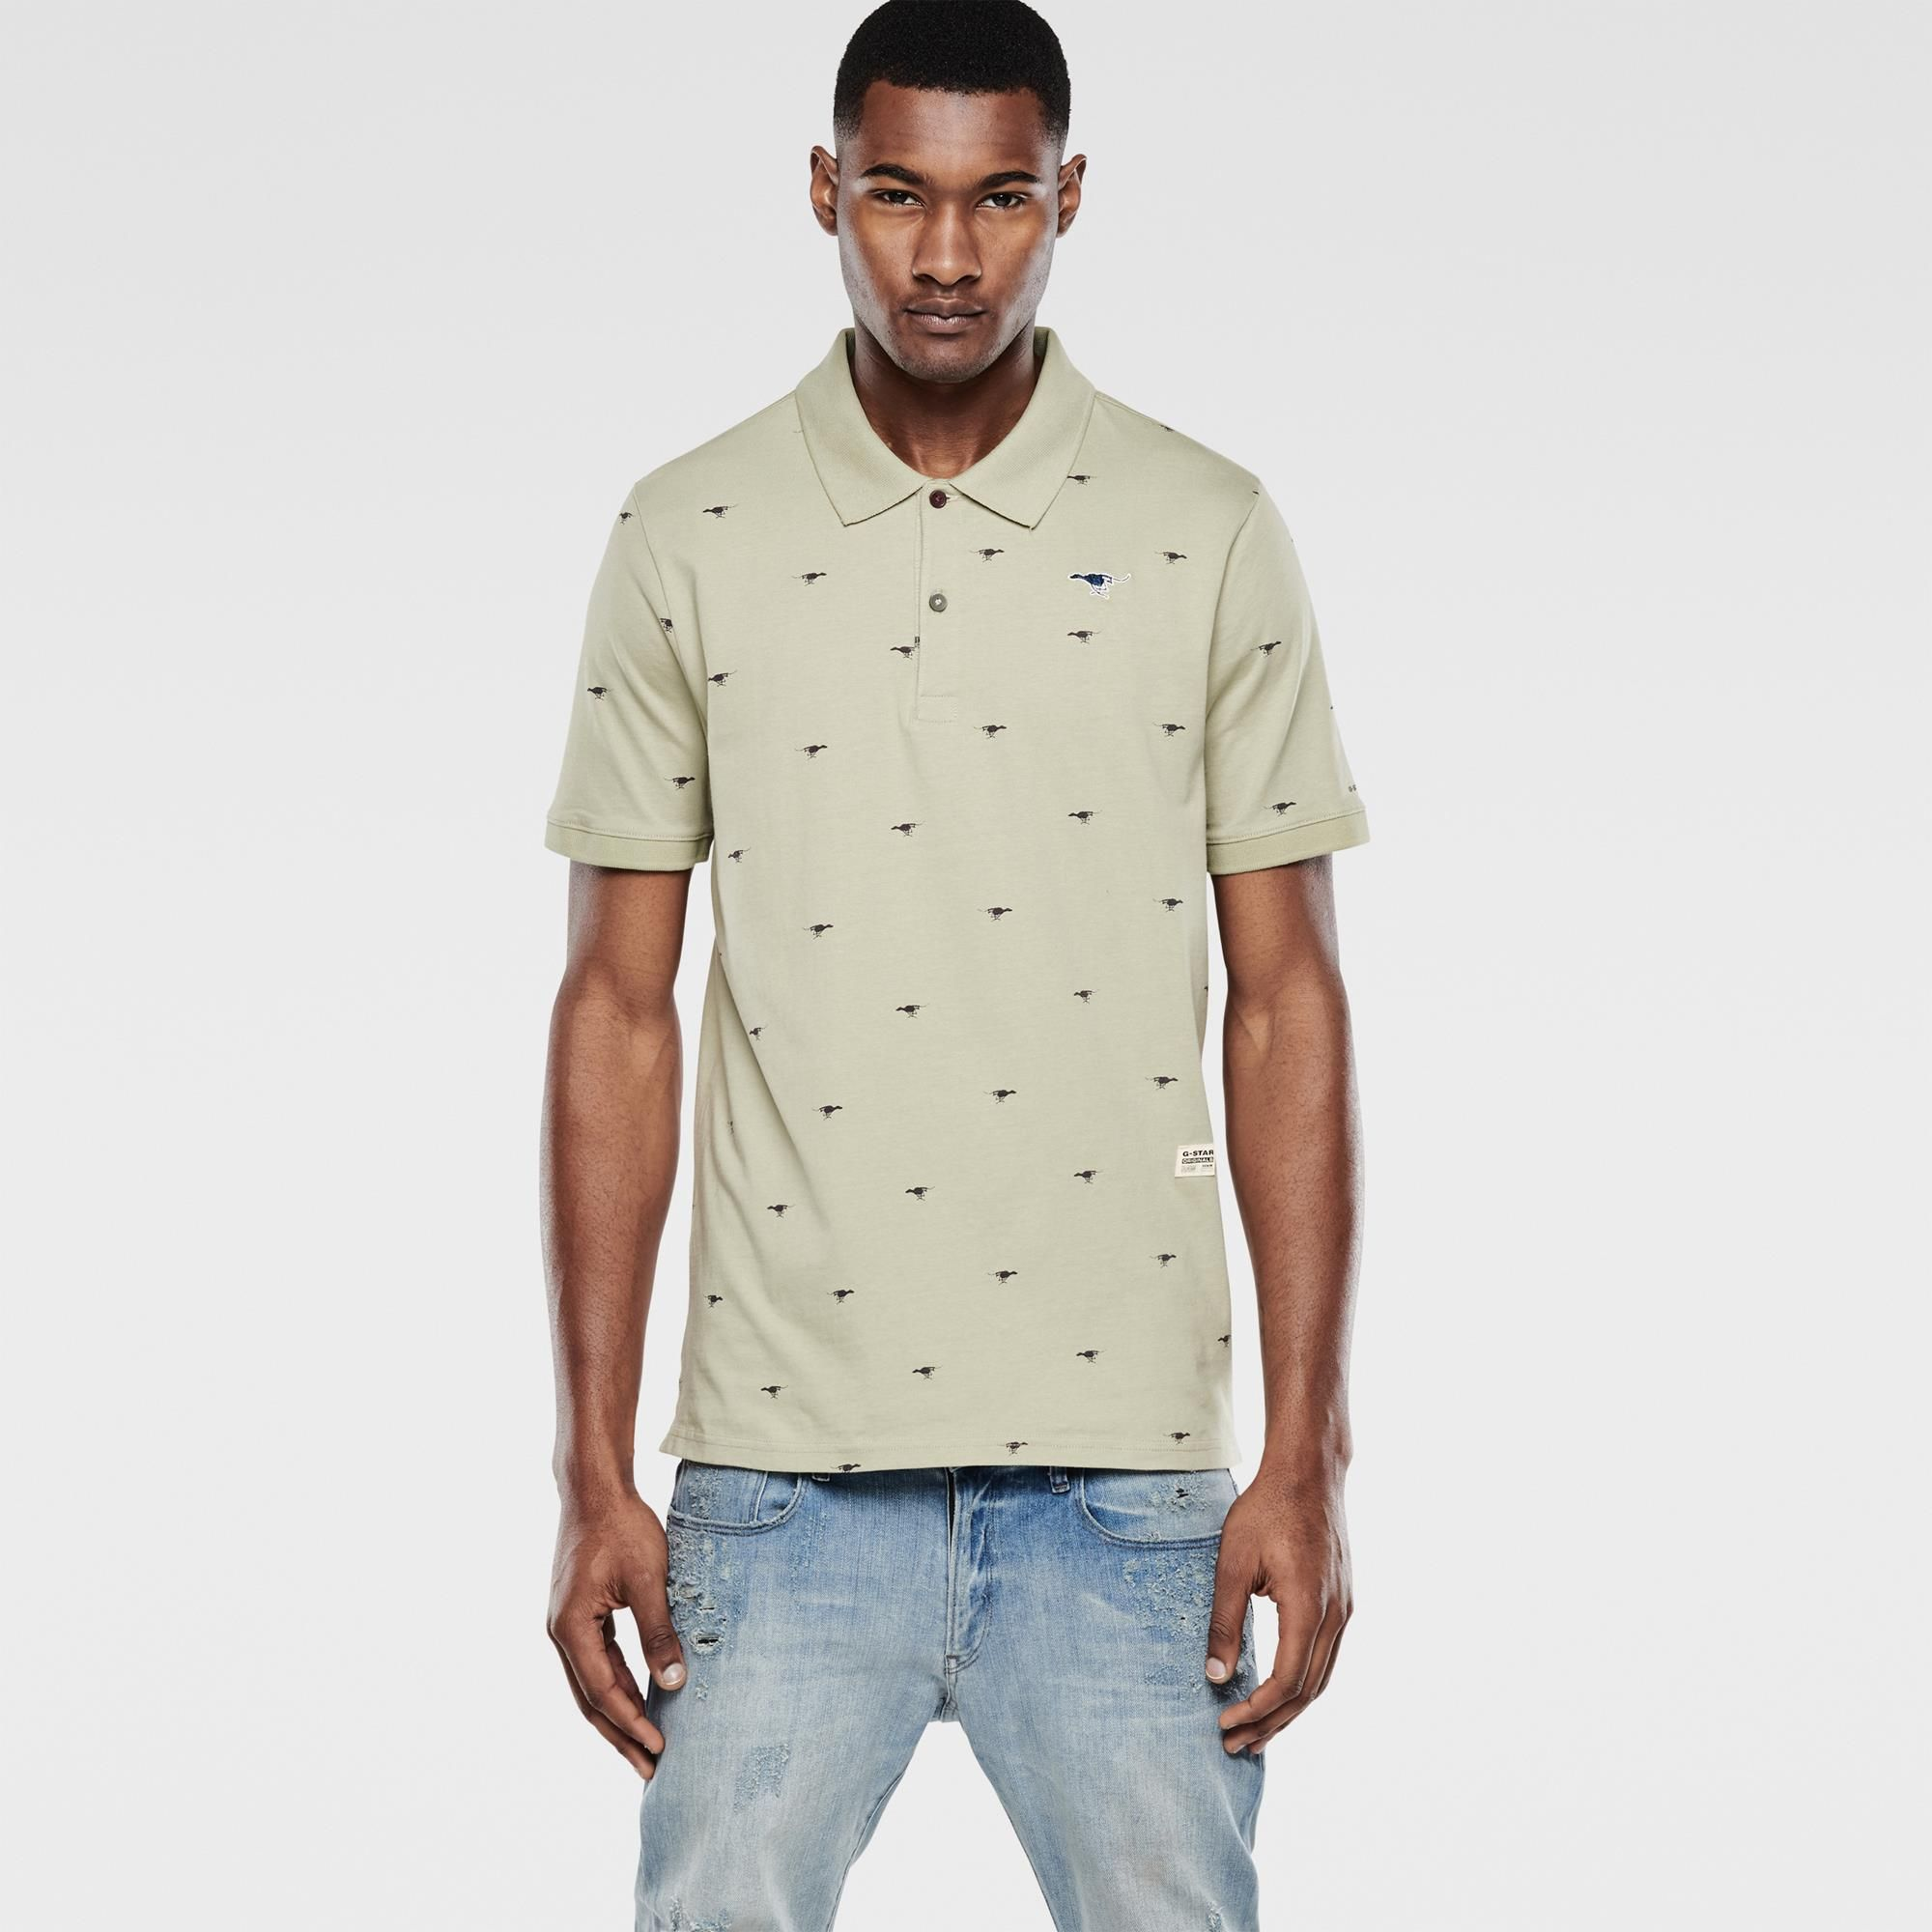 G-Star RAW | Men | T-shirts | Lufab Polo , Grege Green